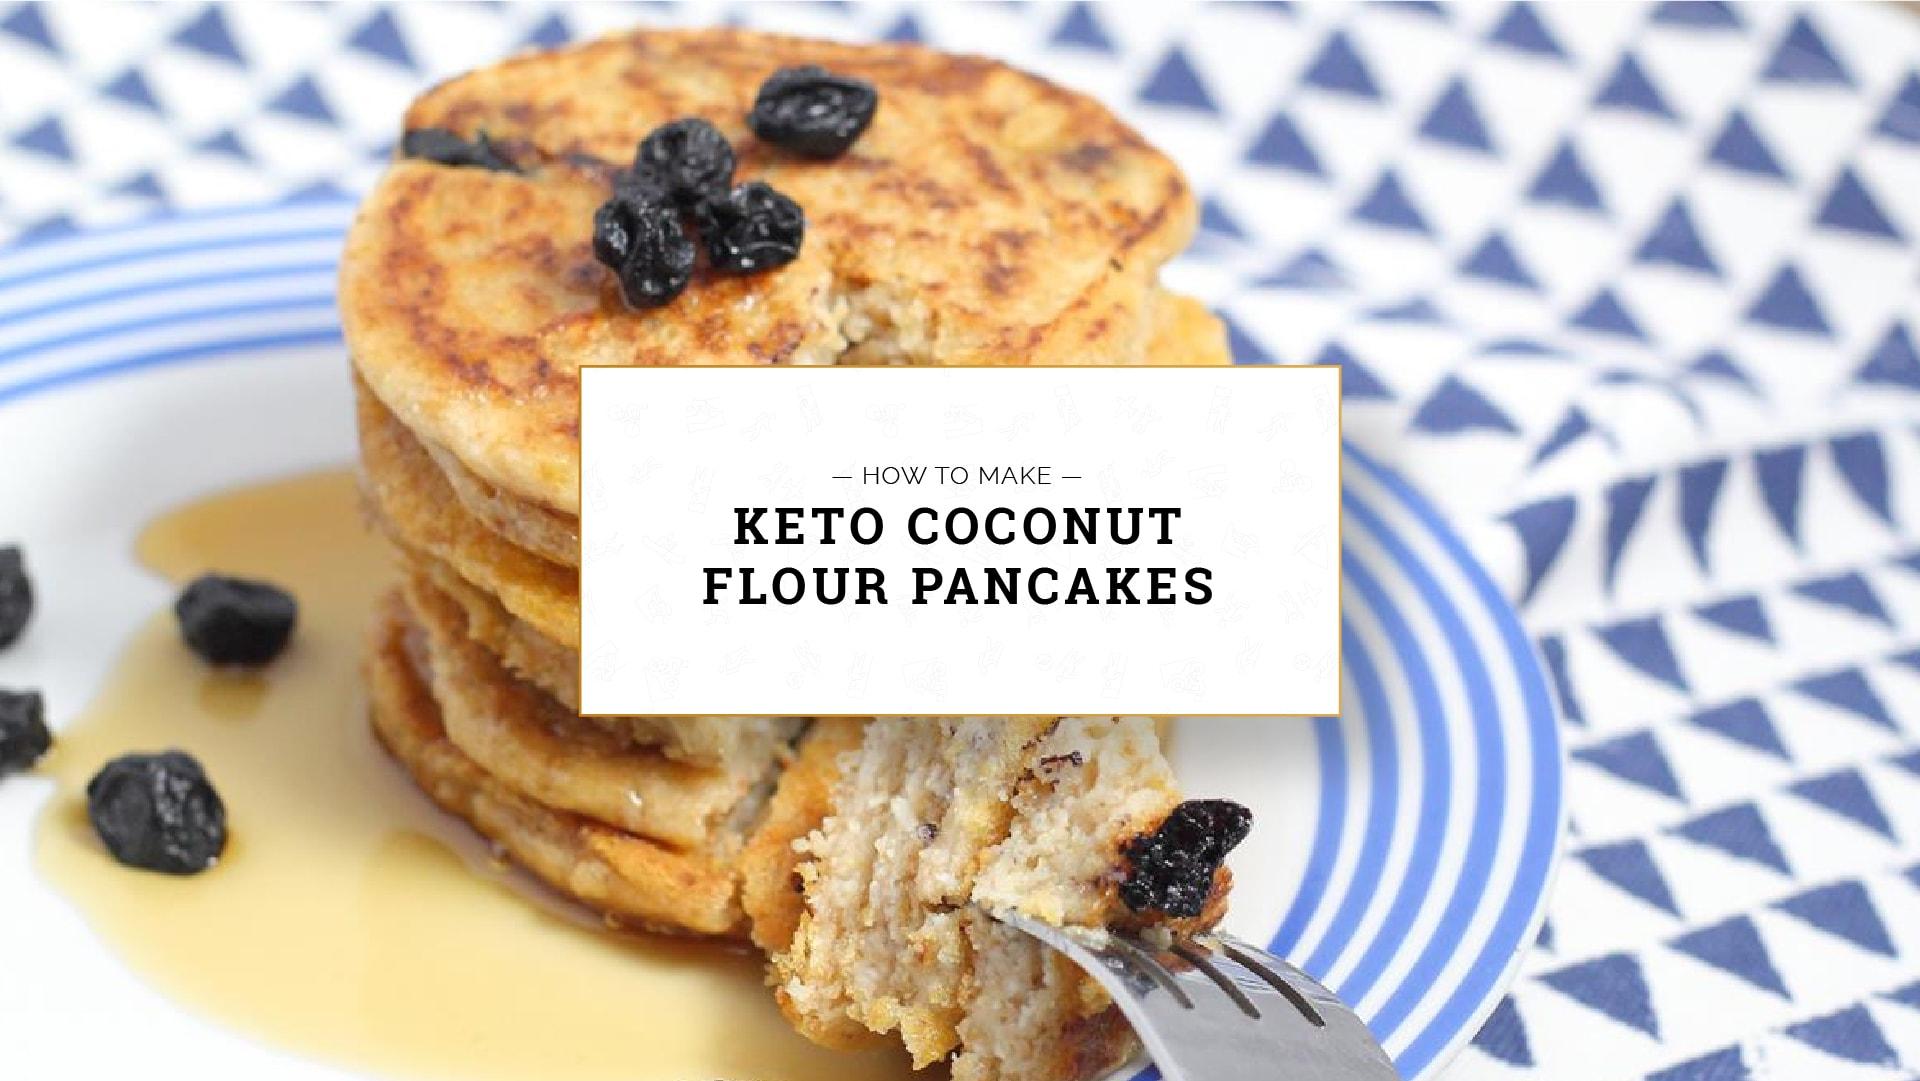 how to make Keto Coconut Flour Pancakes